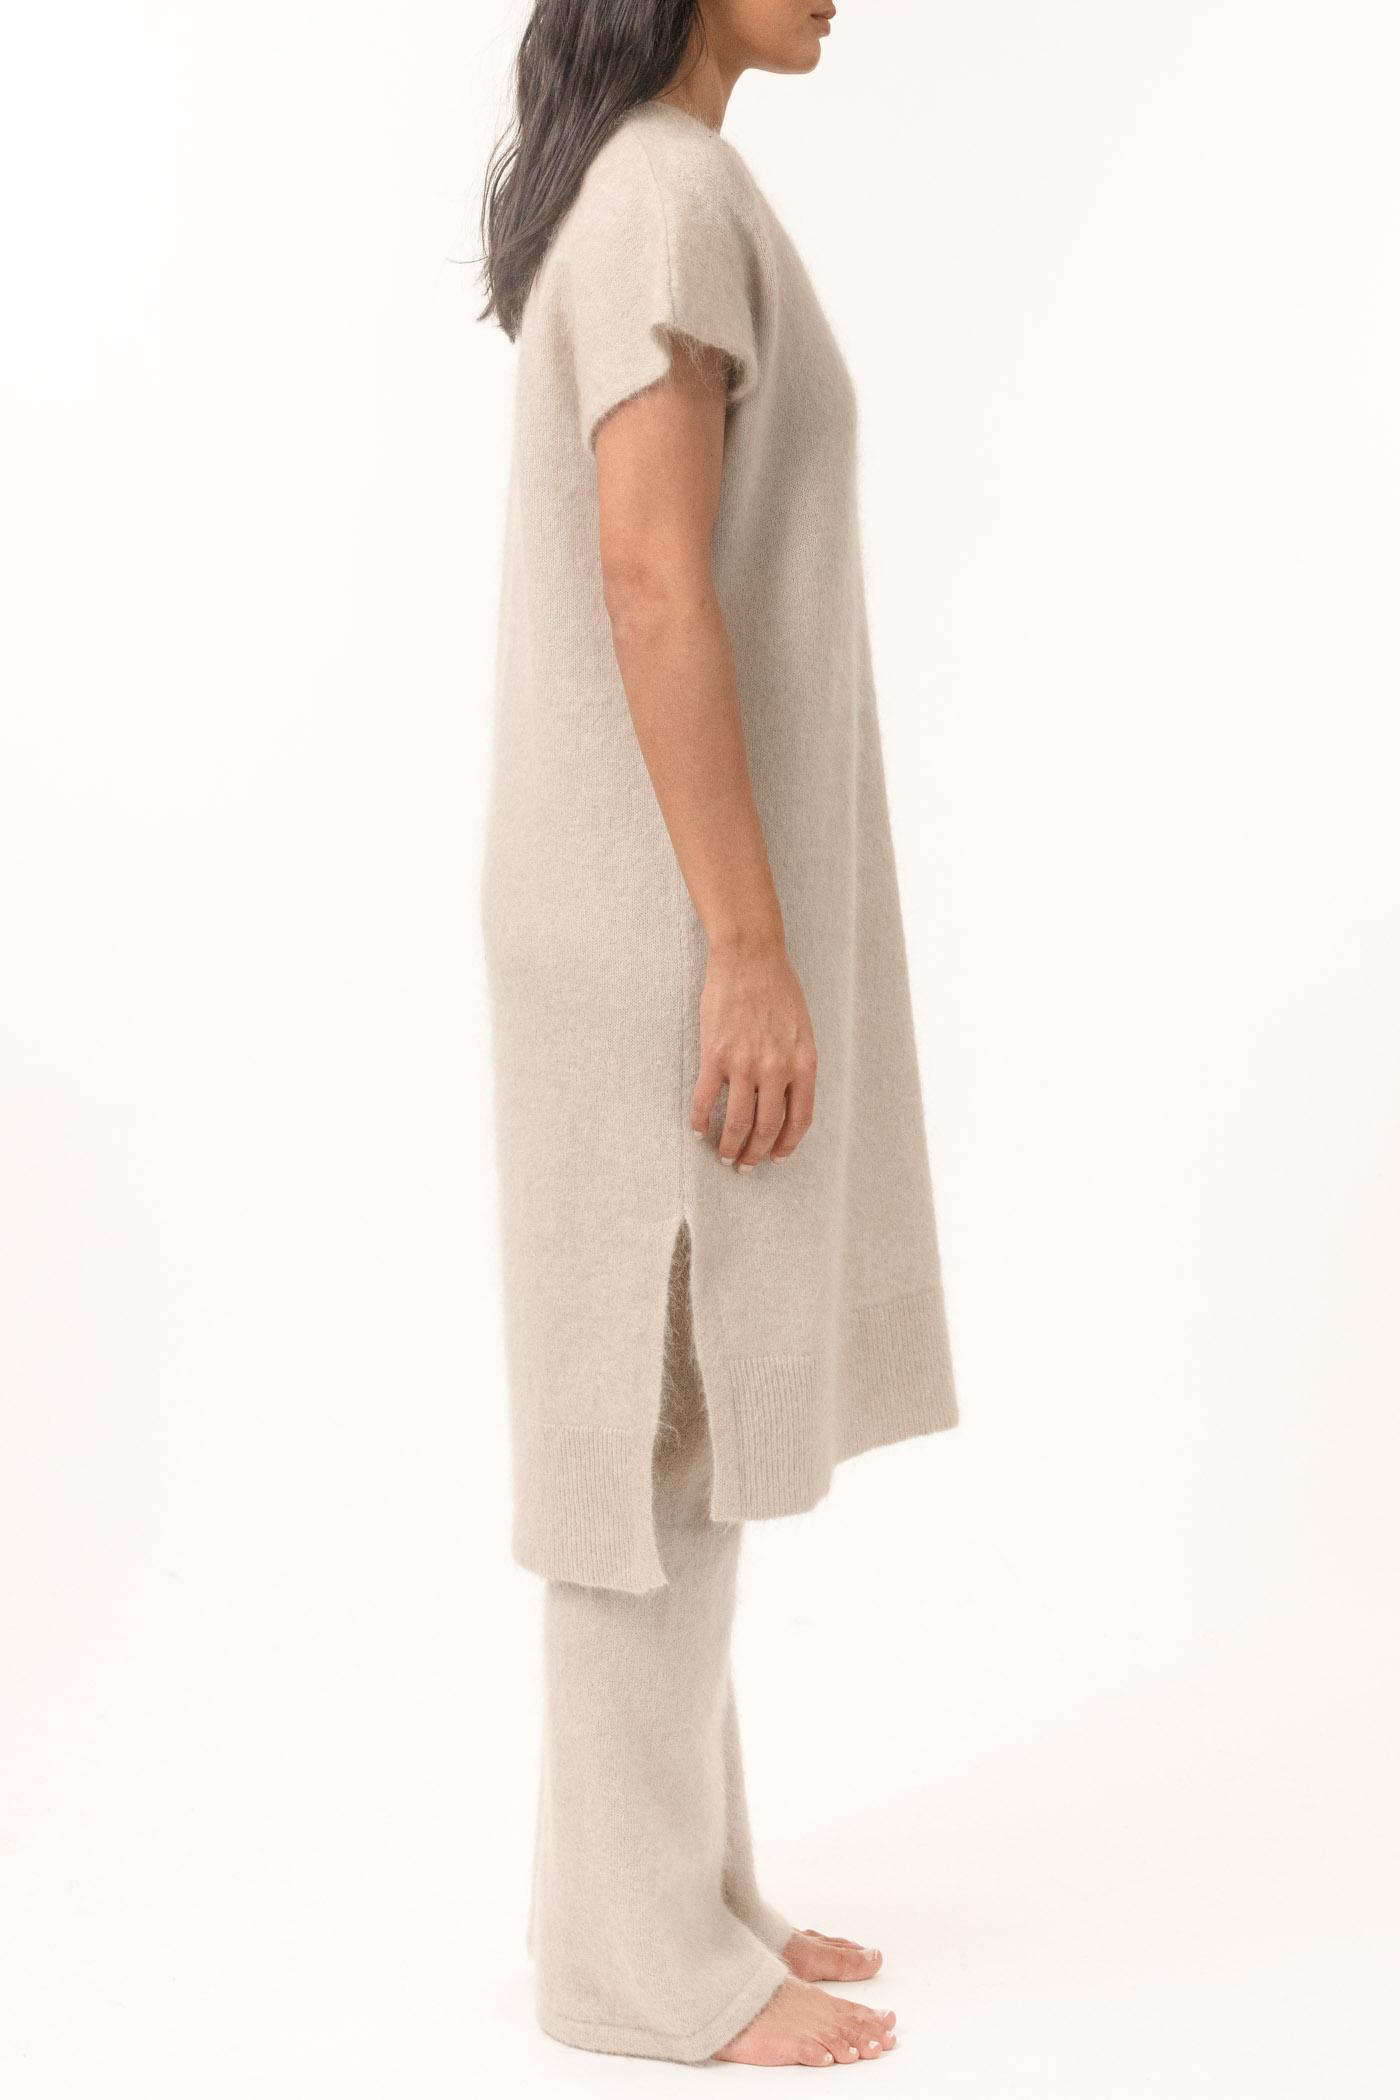 Lys beige soft mohair kjole Cathrine Hammel - soft wide sleeveless dress